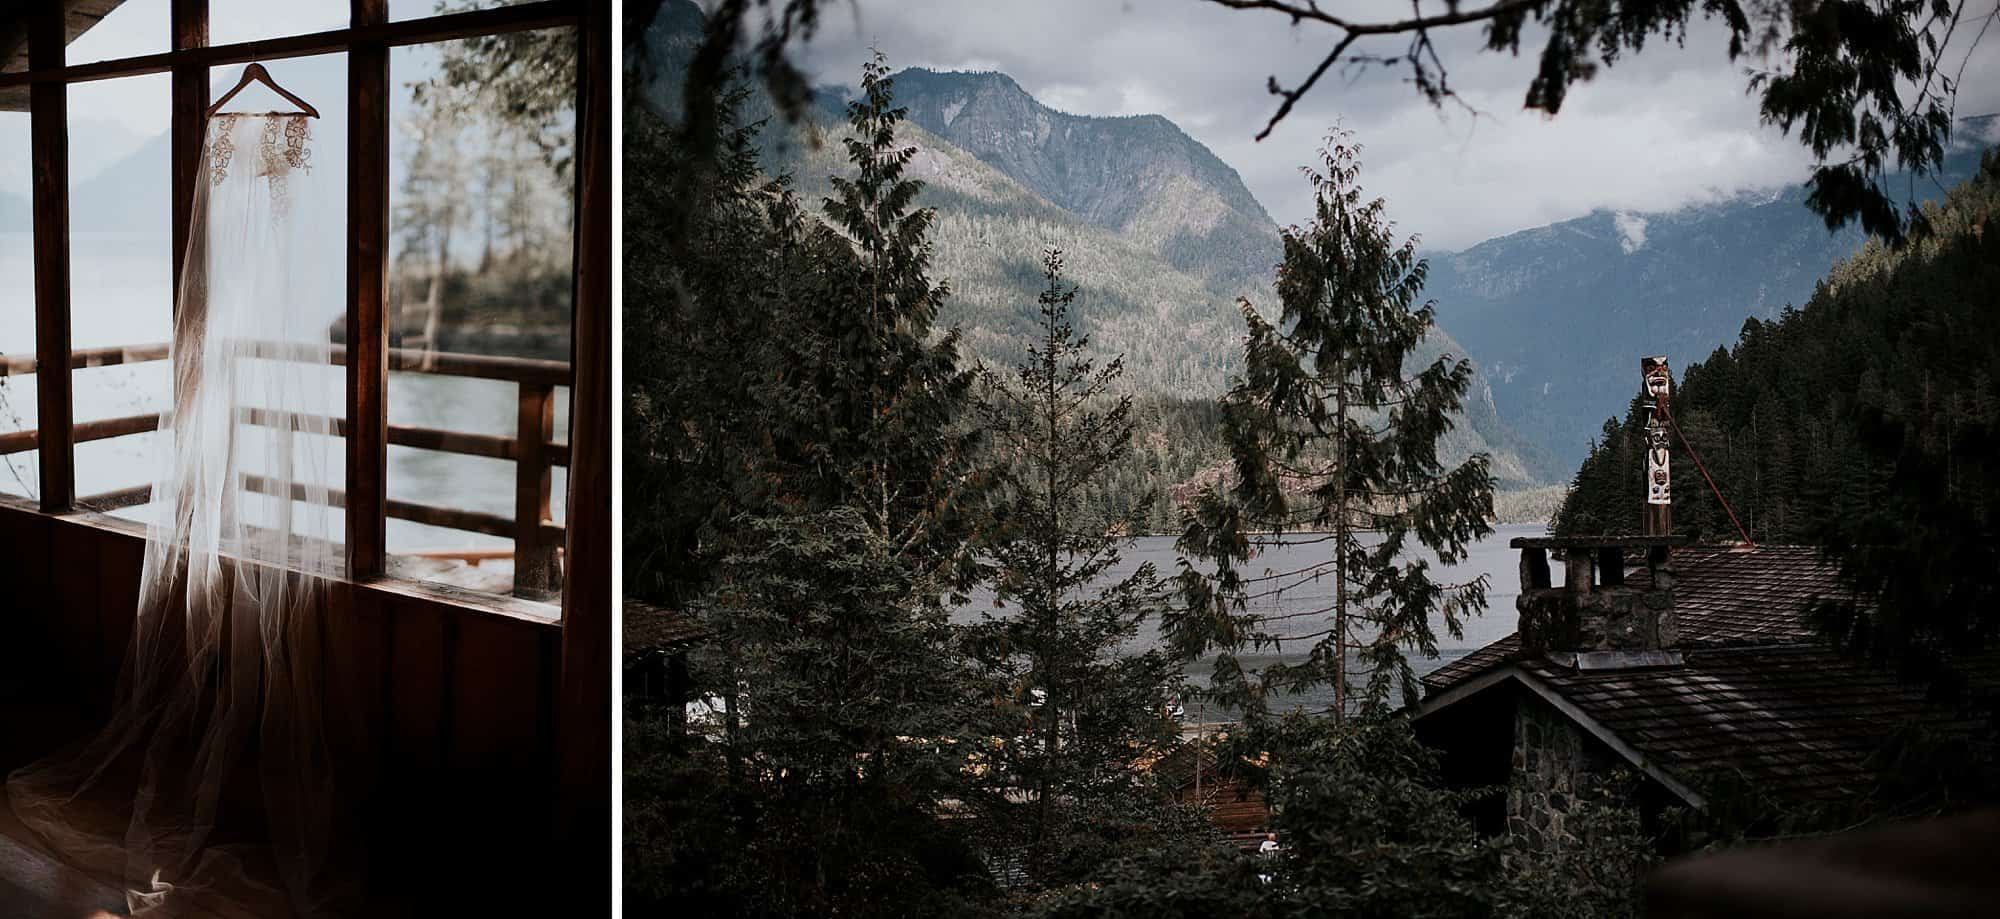 malibu-british-columbia-canada-pacific-northwest-wedding-0010